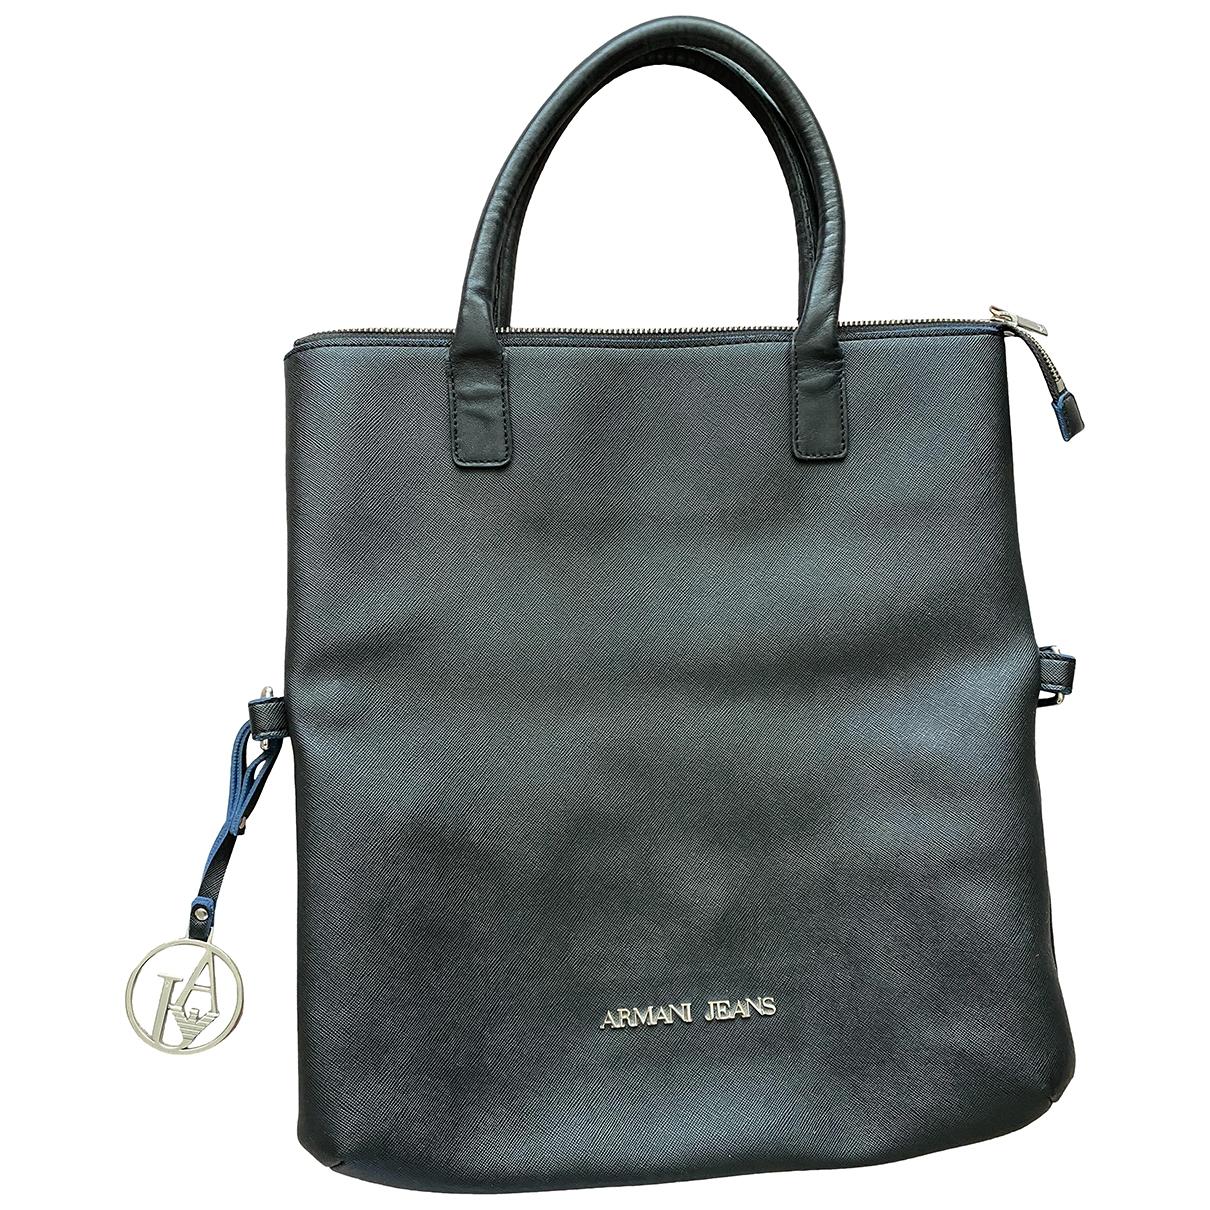 Armani Jeans \N Black handbag for Women \N